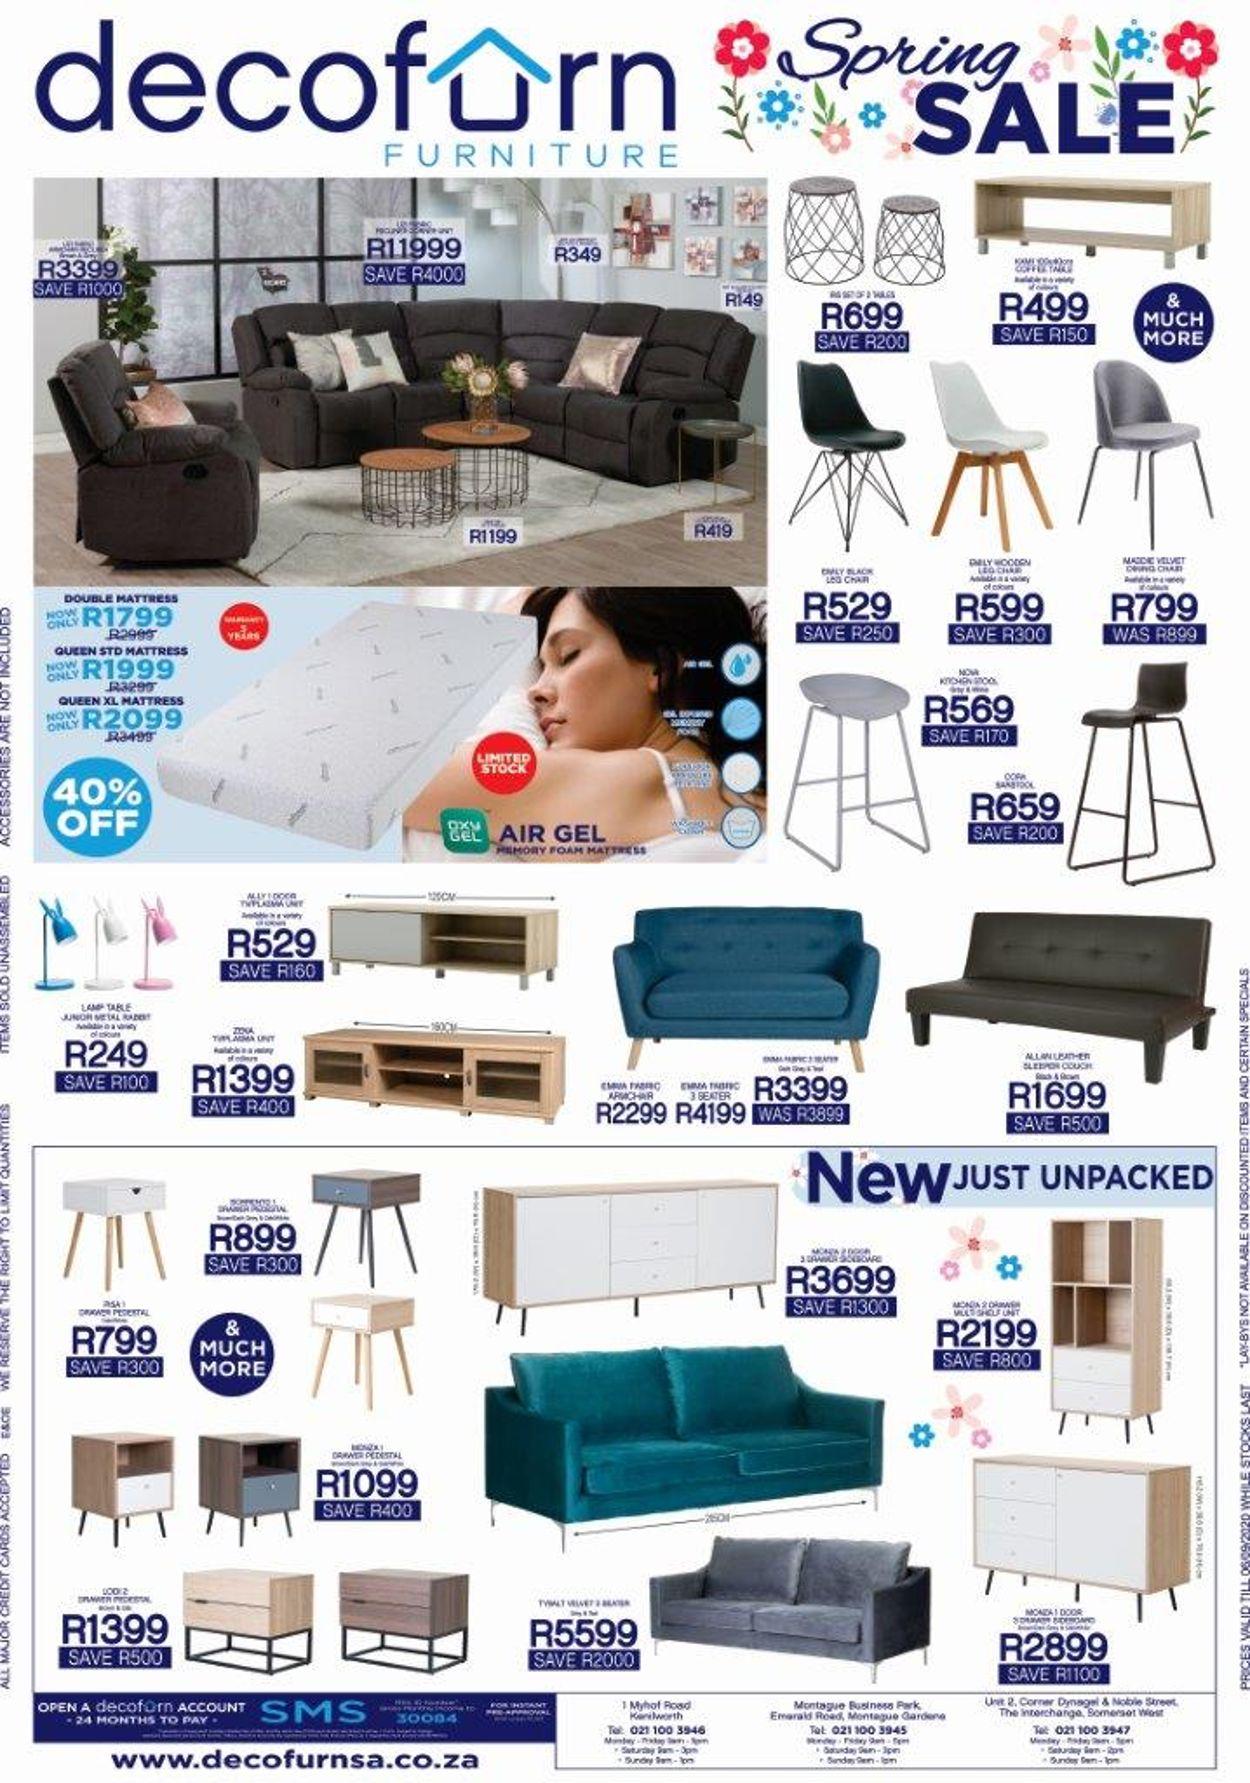 Decofurn Factory Shop Catalogue - 2020/08/31-2020/09/05